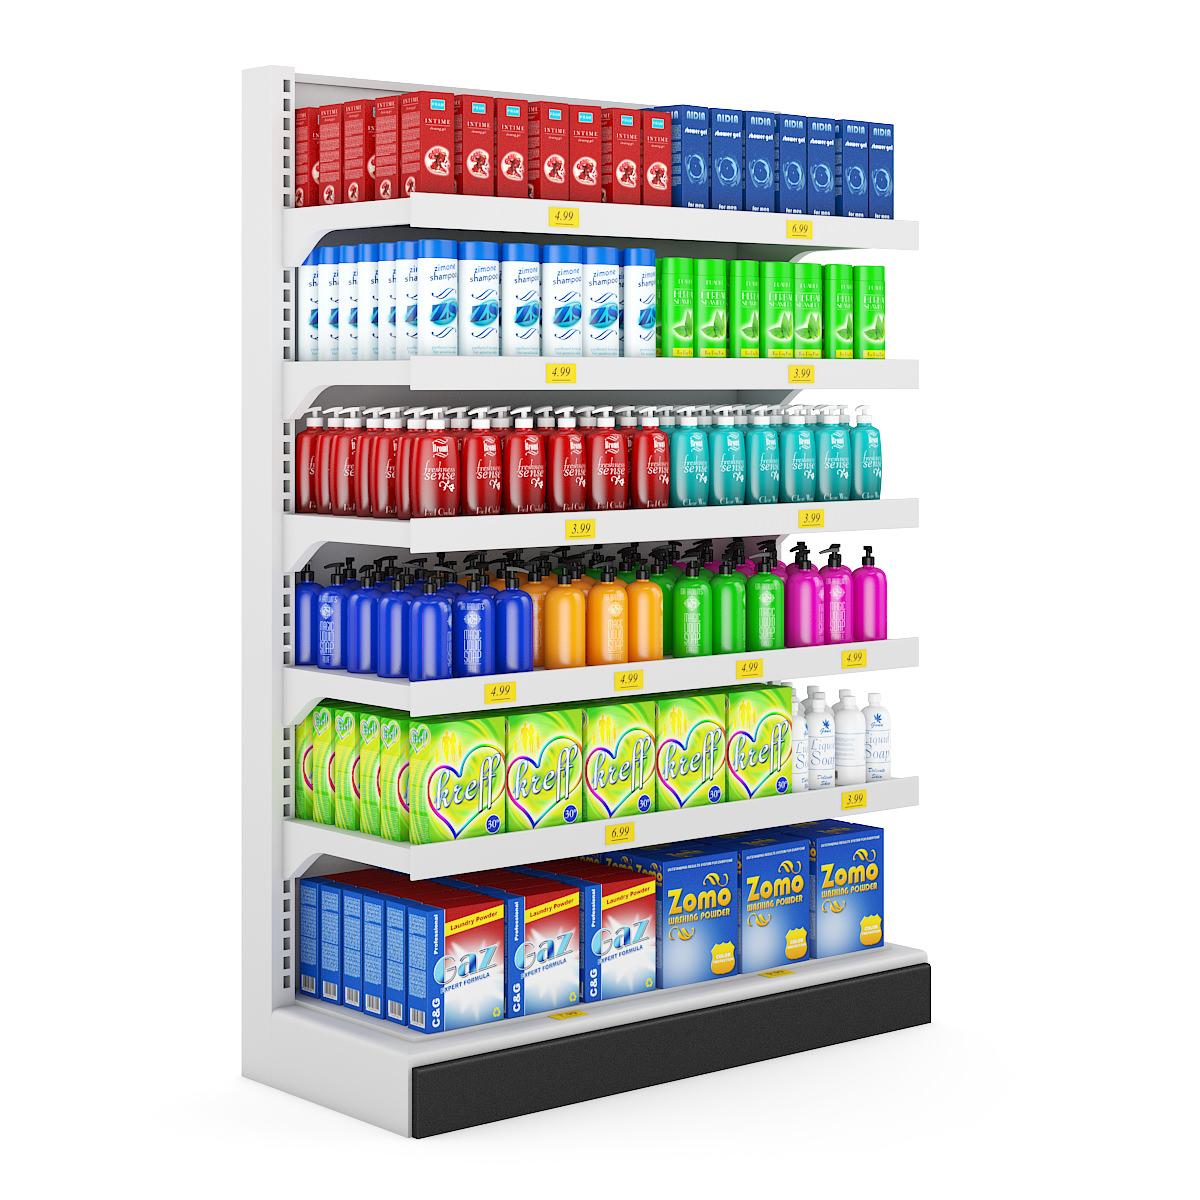 3d Shelves Wallpaper Supermarket Shelf 10 3d Model C4d Cgtrader Com